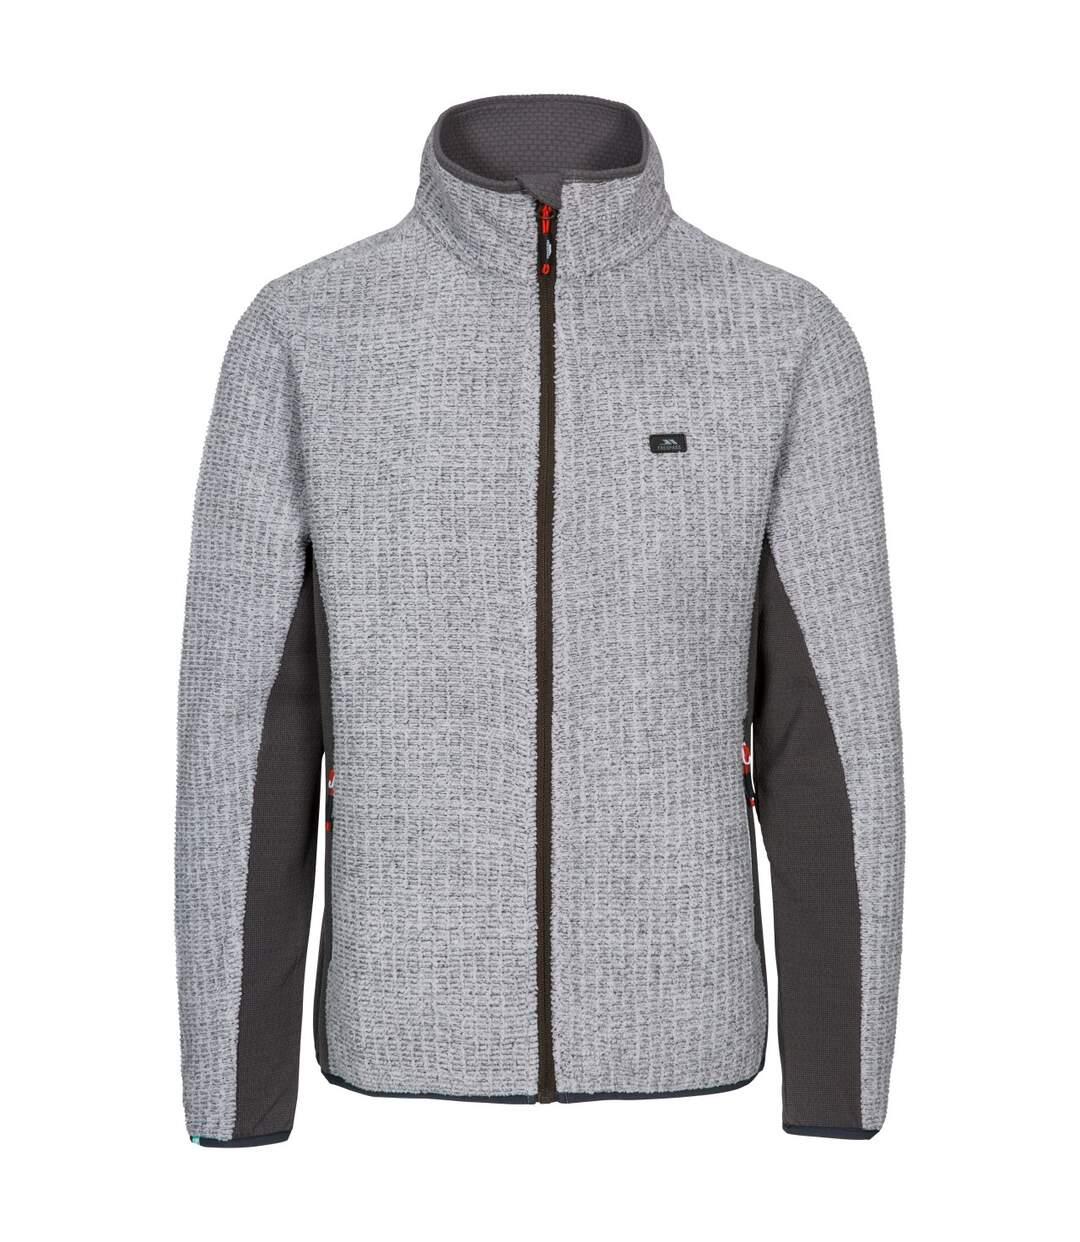 Trespass Mens Templetonpeck Fleece Jacket (Platinum) - UTTP4446